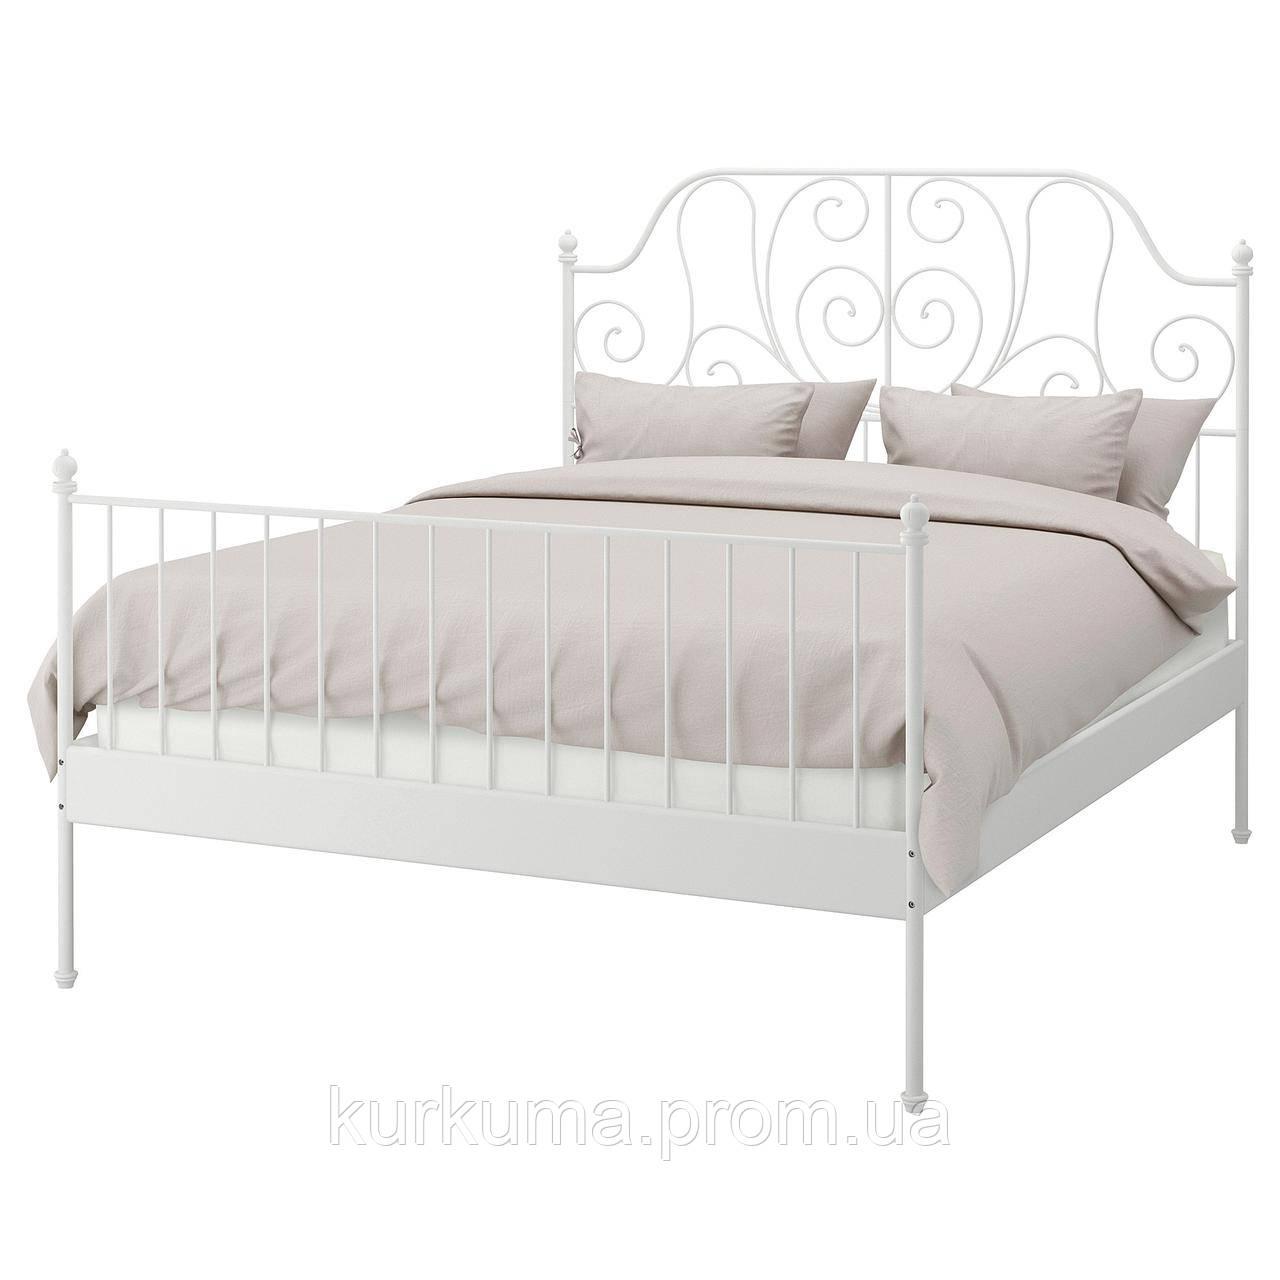 IKEA LEIRVIK Кровать, белый  (192.772.63)